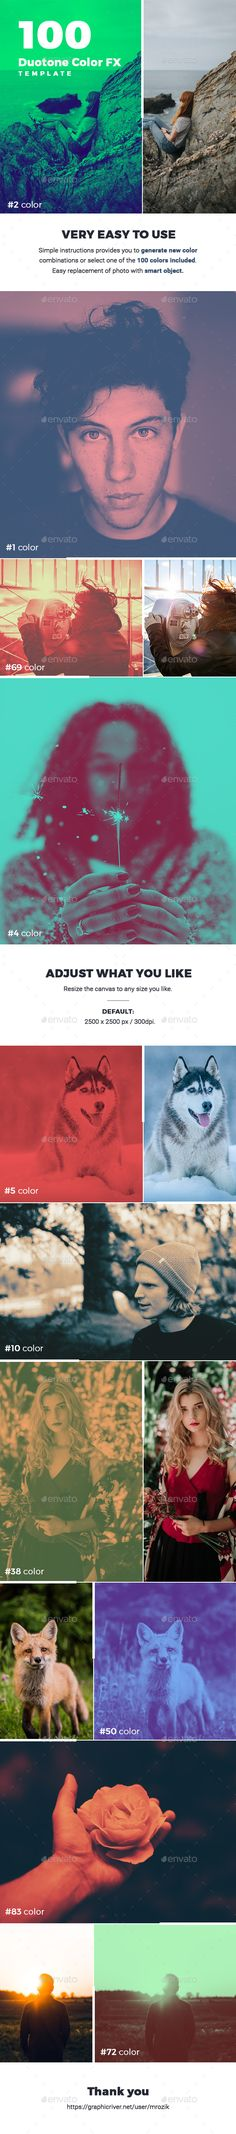 Polaroid Template Polaroid, Template and Psd templates - polaroid template